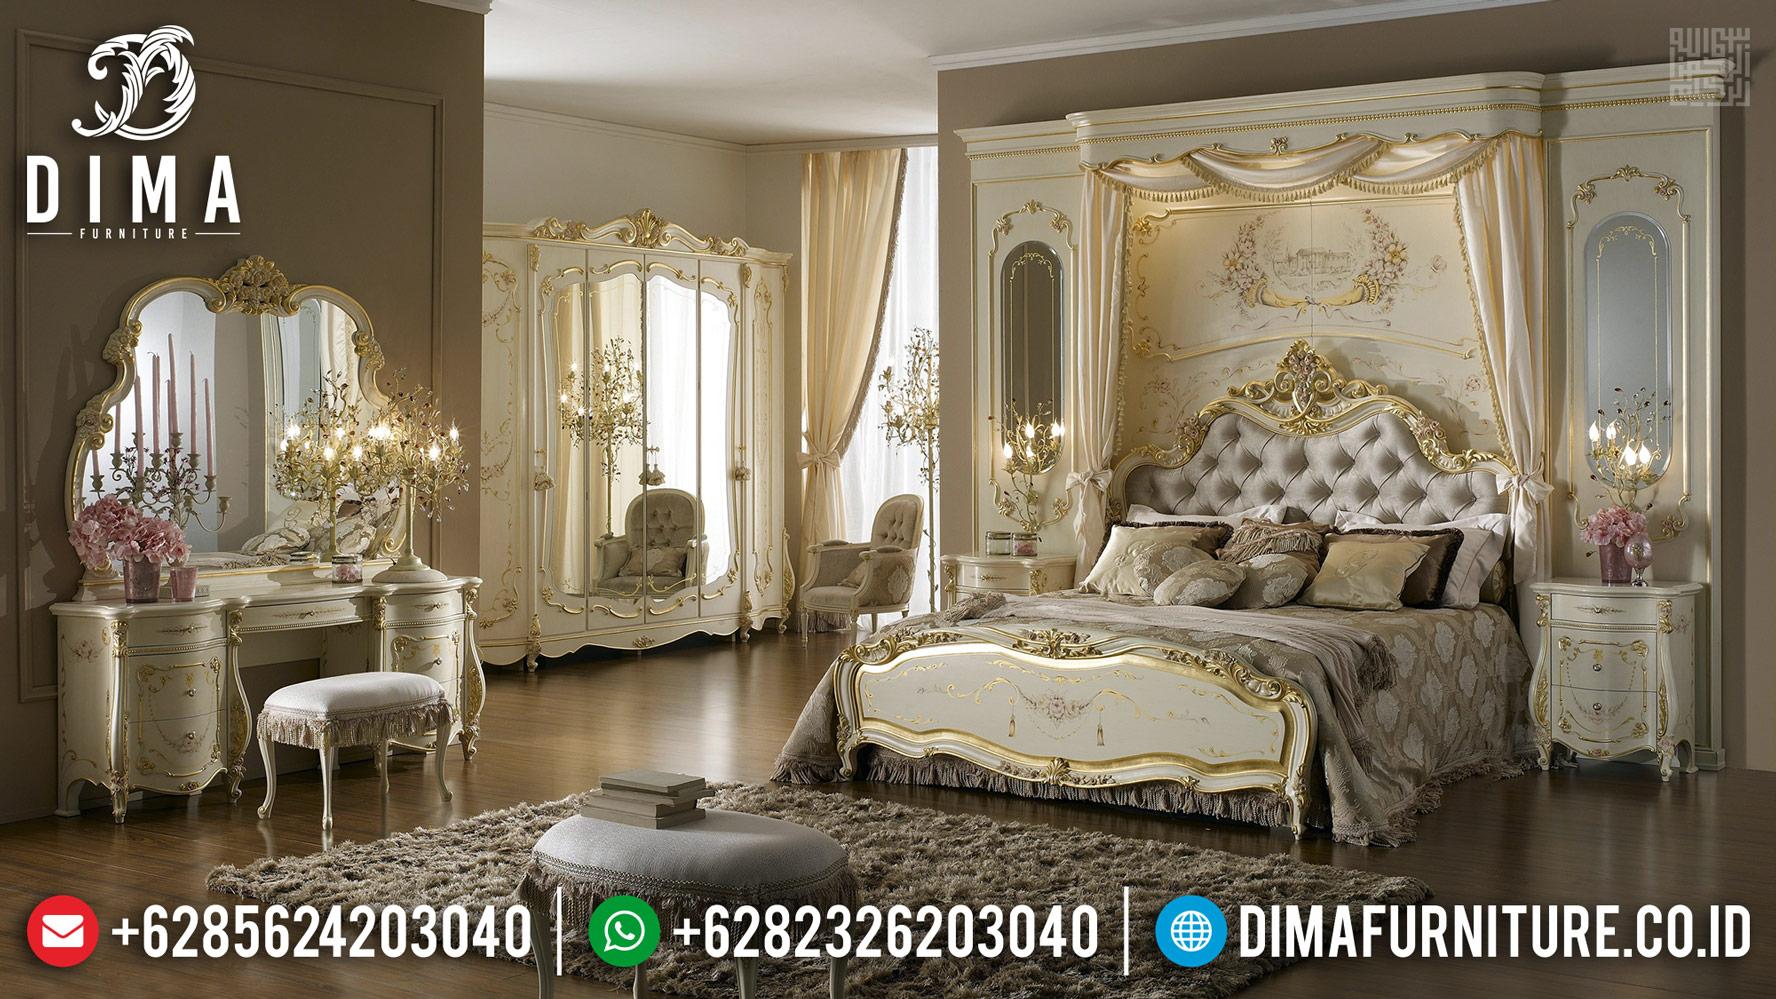 Harga Tempat Tidur Mewah European Classic Furniture Jepara Luxury BT-0385